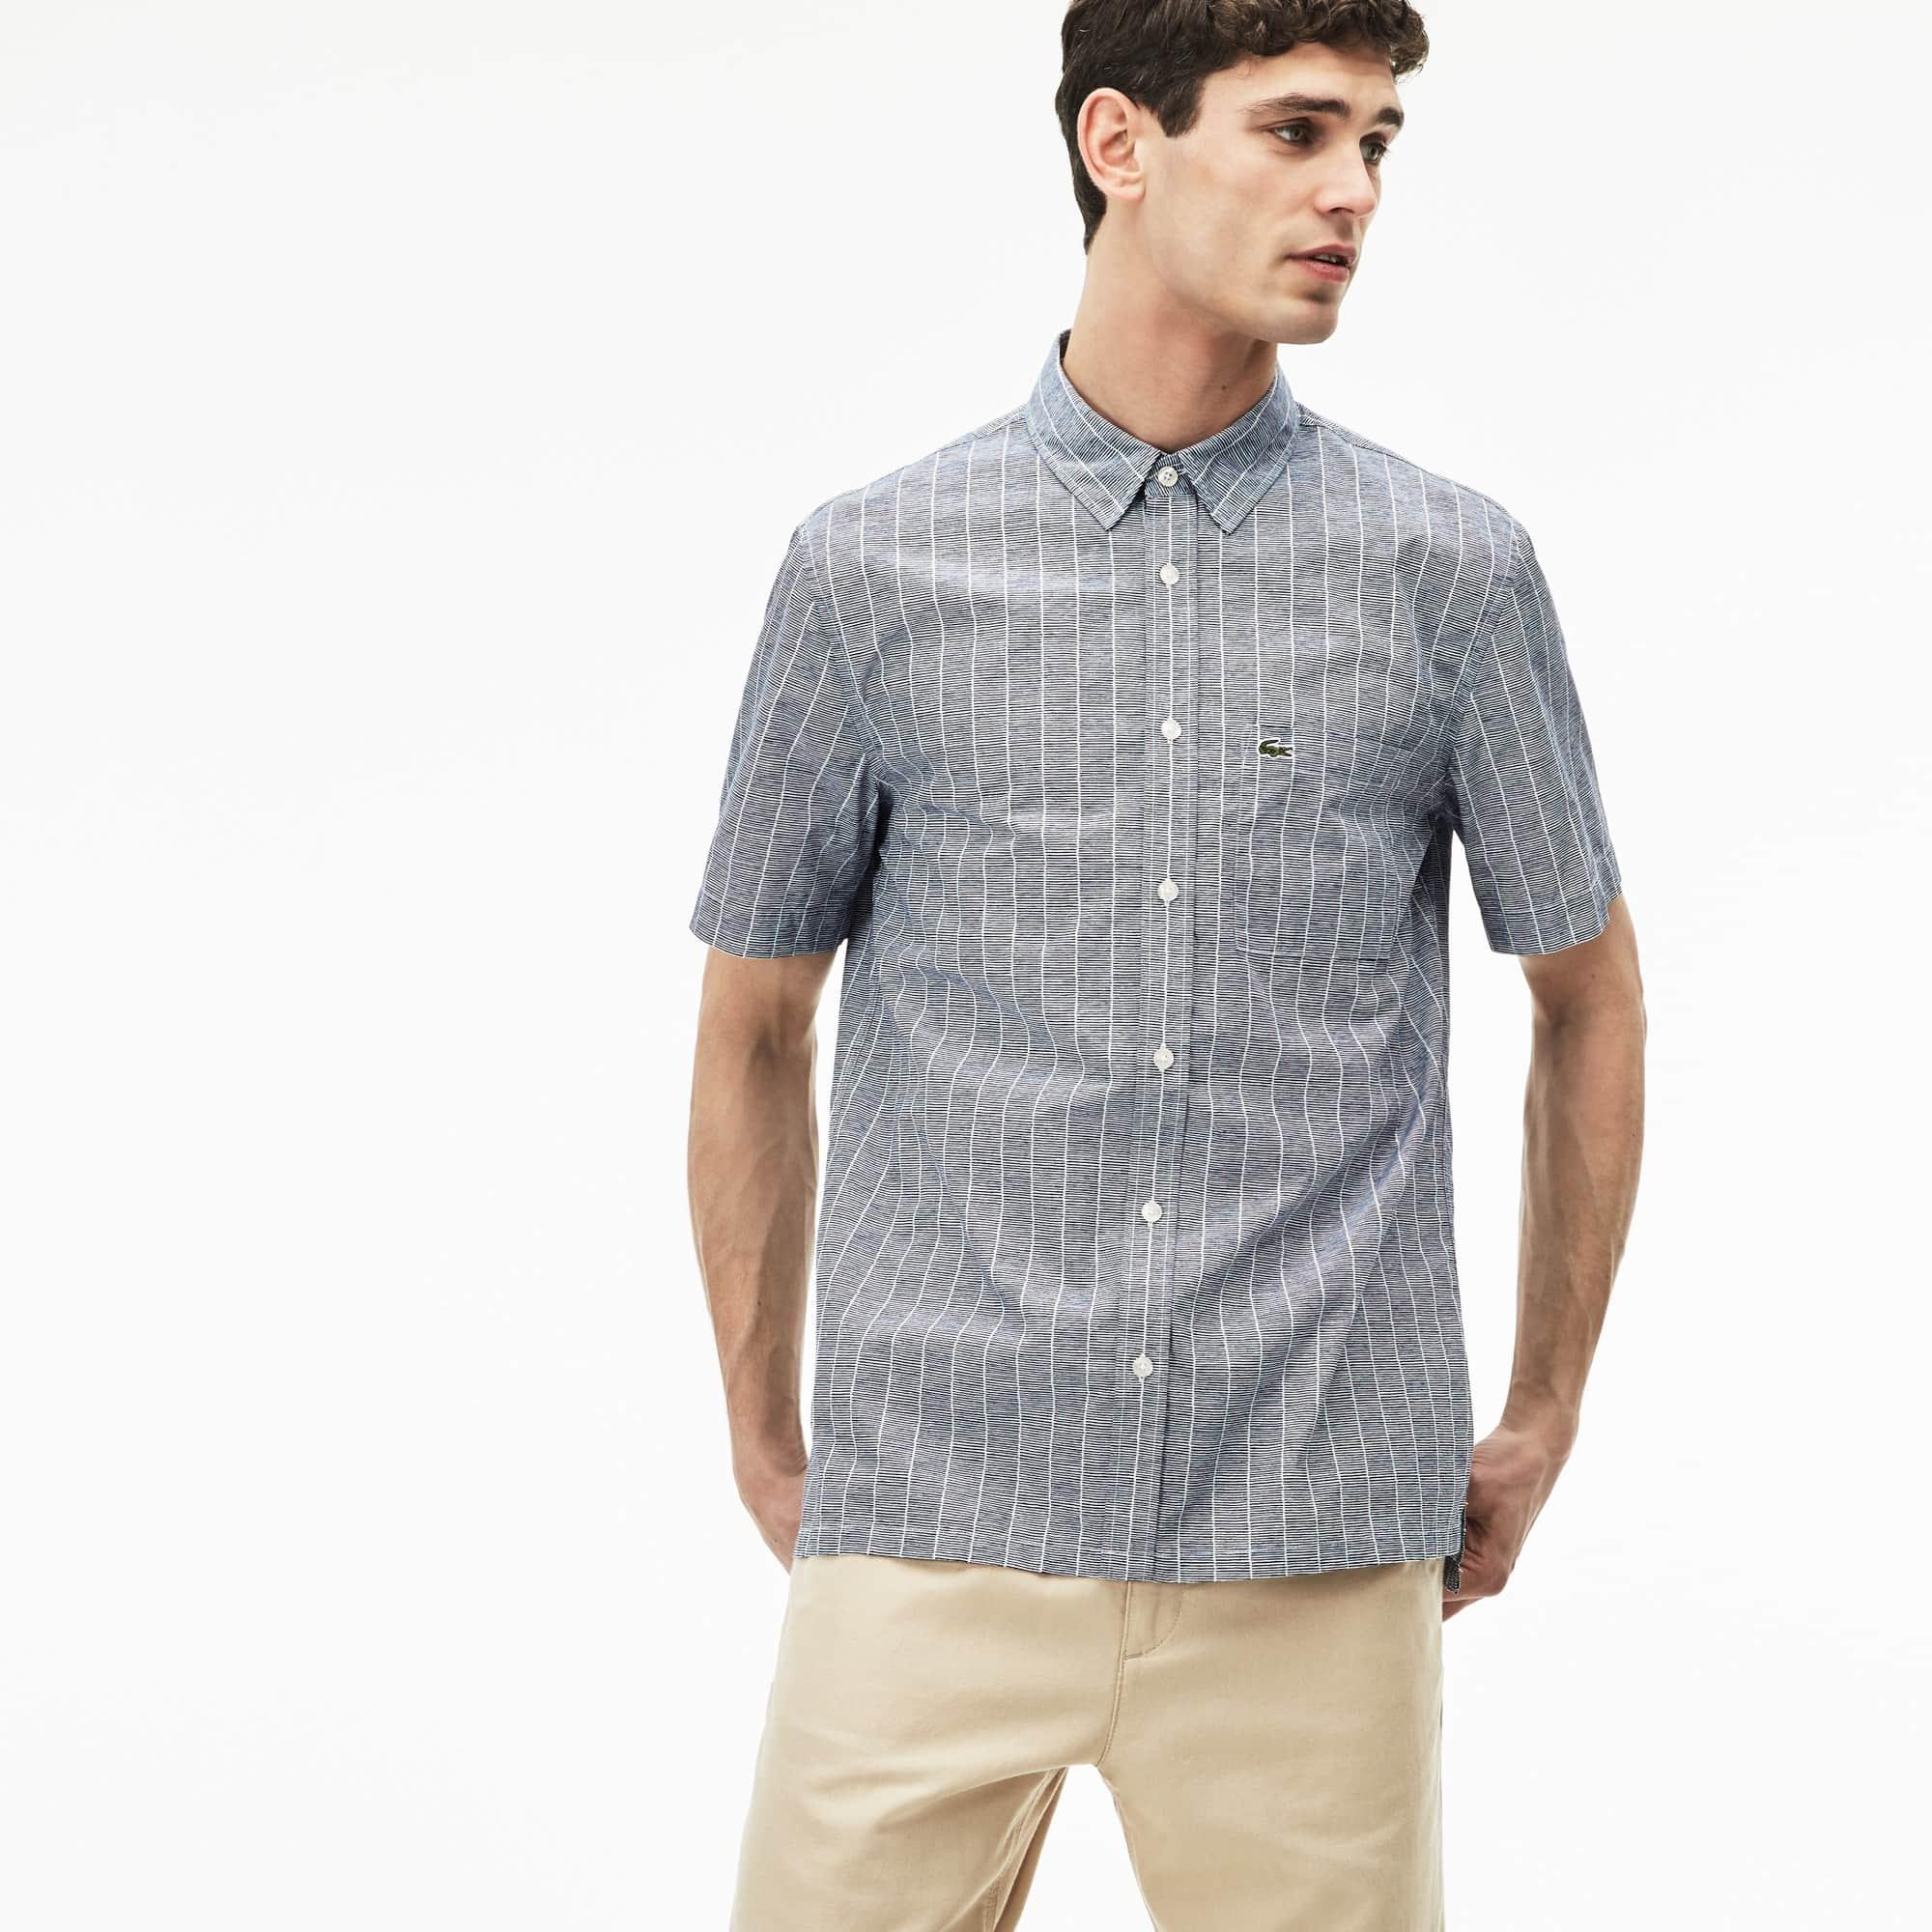 Camisa relax fit de manga corta en popelín estampado